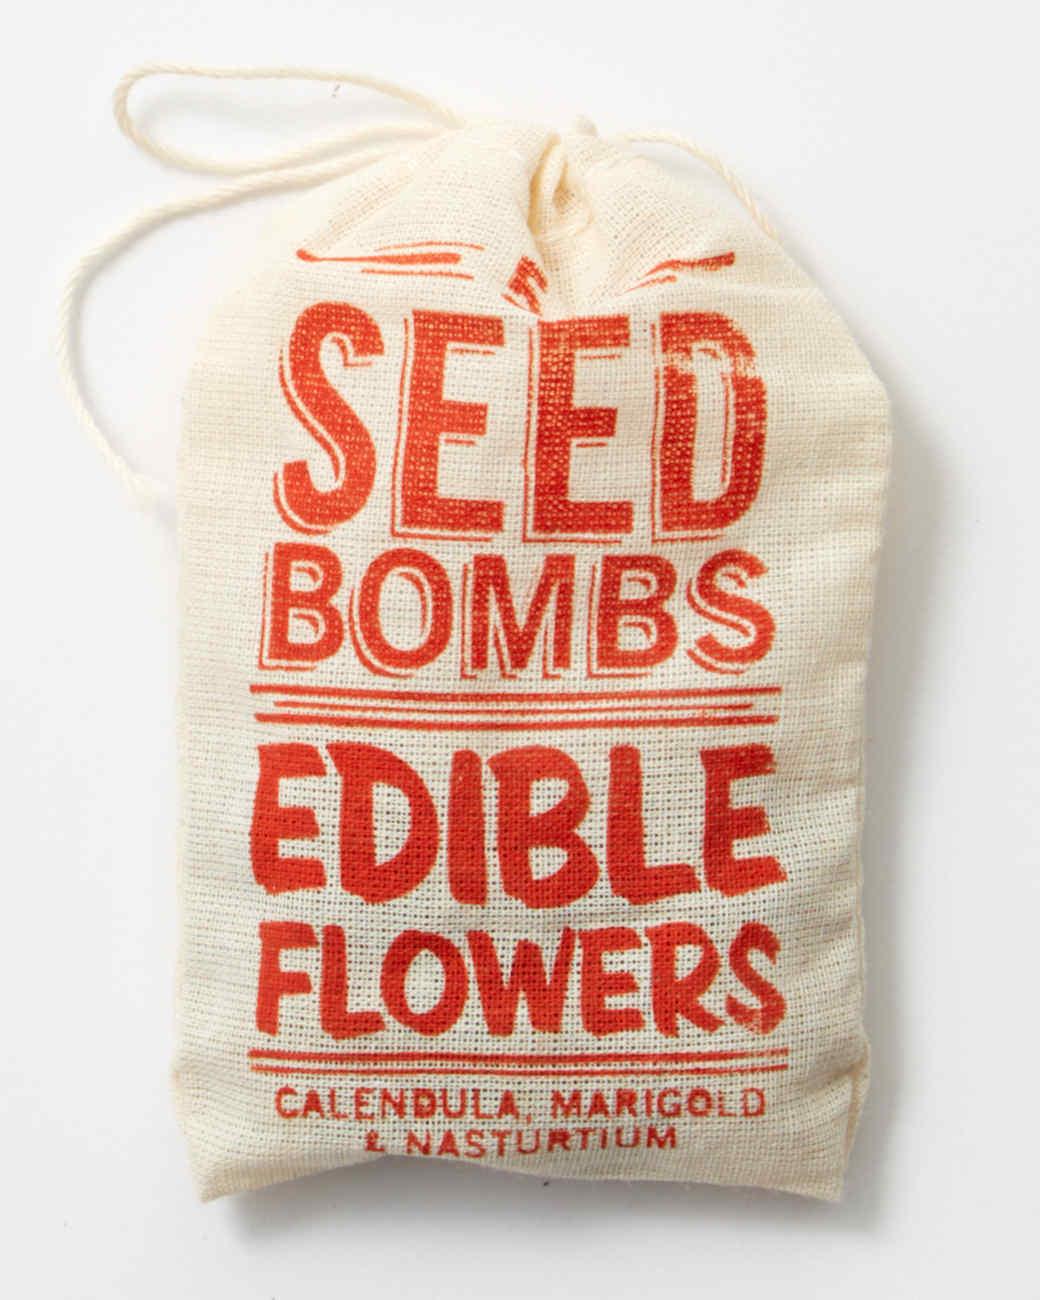 garden-seed-bomb-2981-d112789-0116.jpg